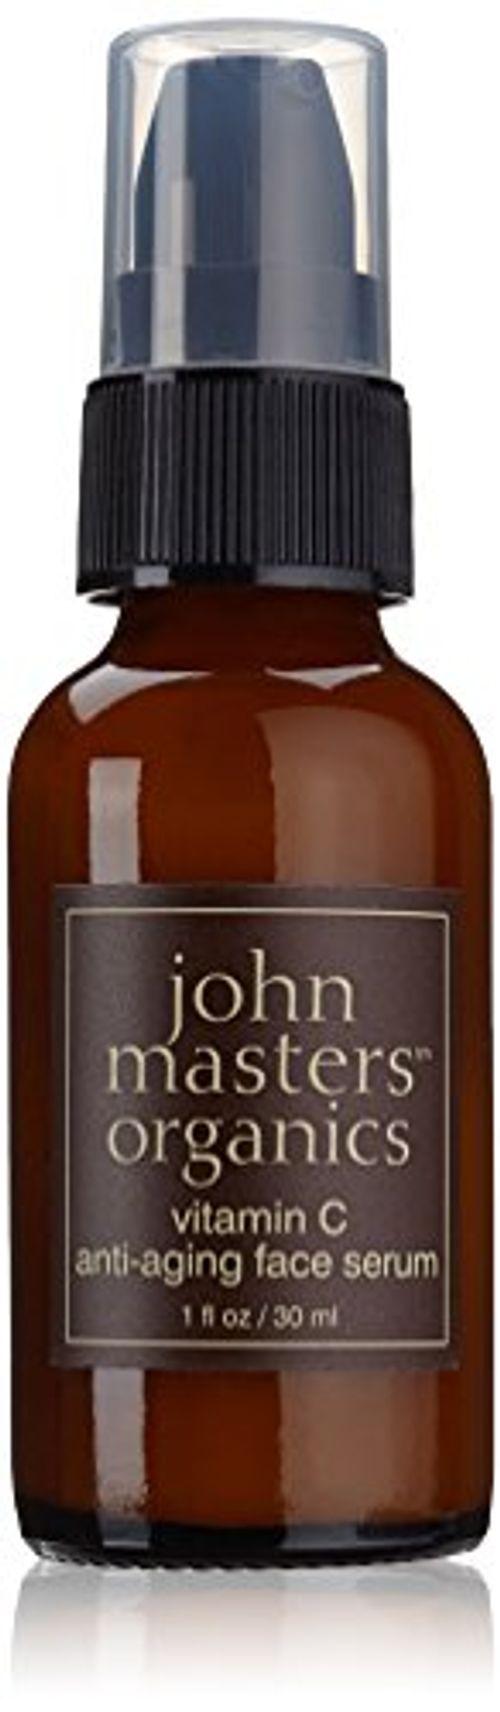 photo Wallpaper of John Masters Organics-John Masters Organics   Sérum Anti Aging Para Cara Con Vitamina C, 30-